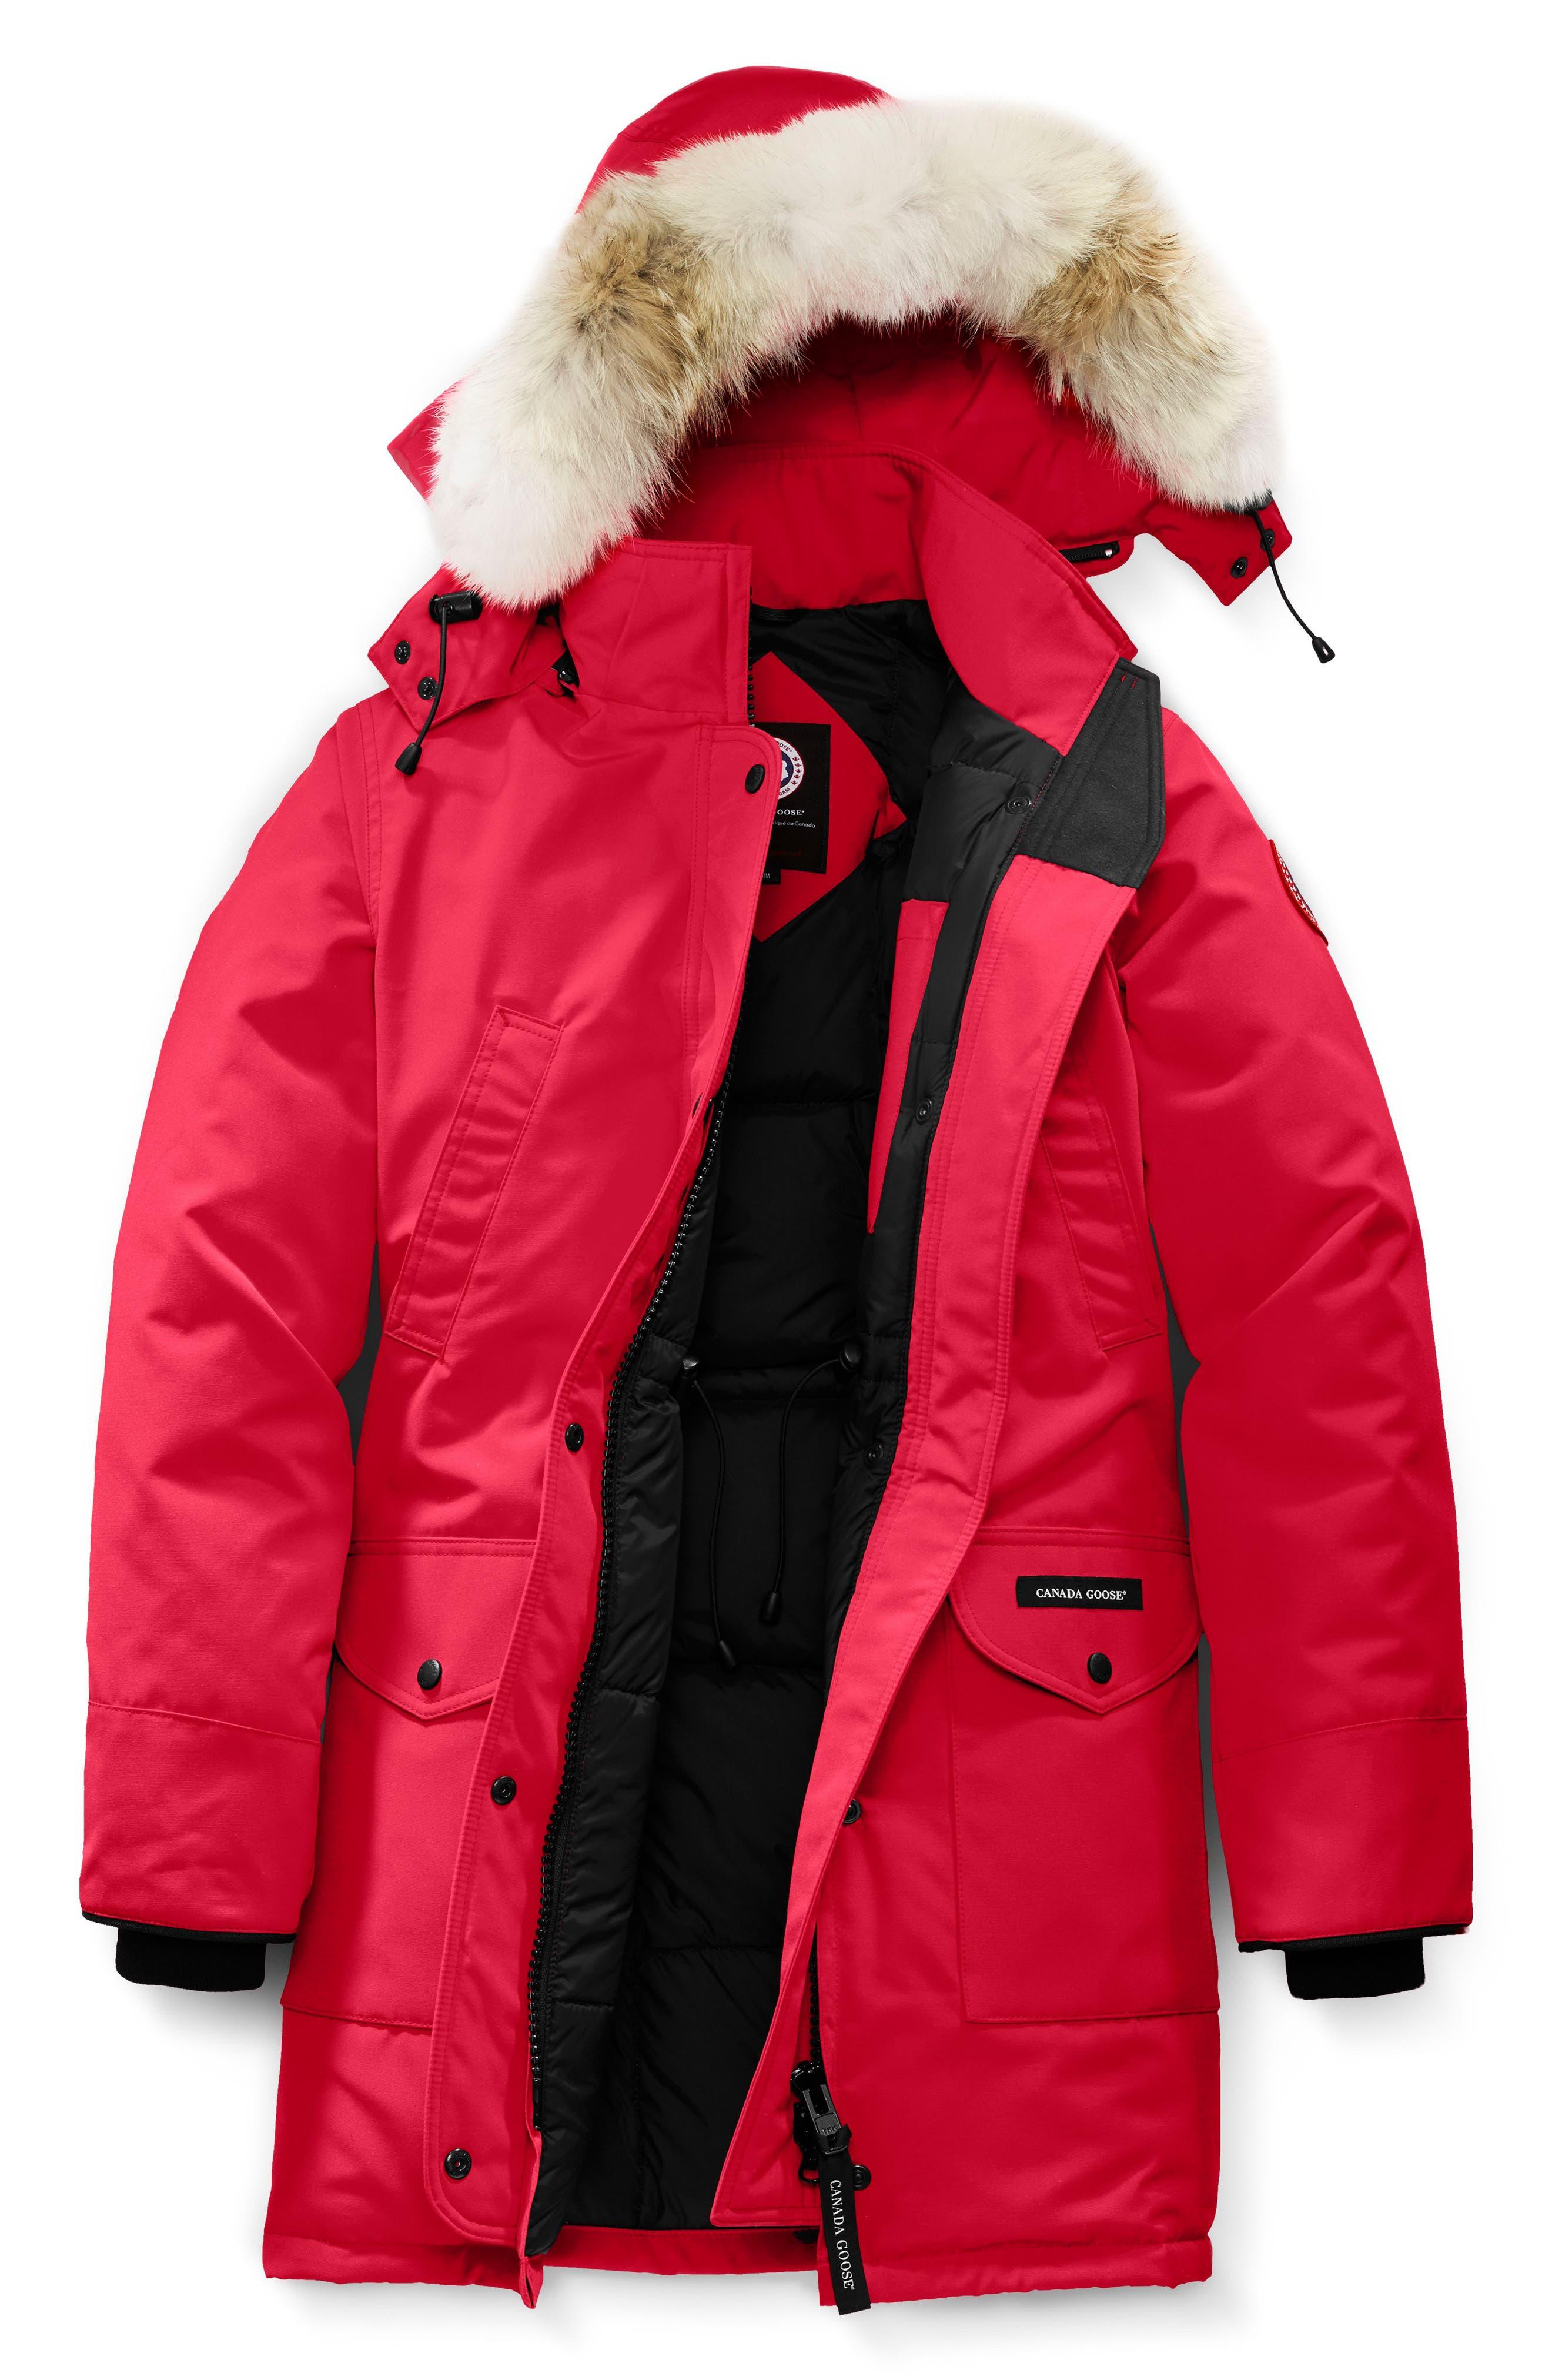 146926a1838 Women s Canada Goose Petite Clothing